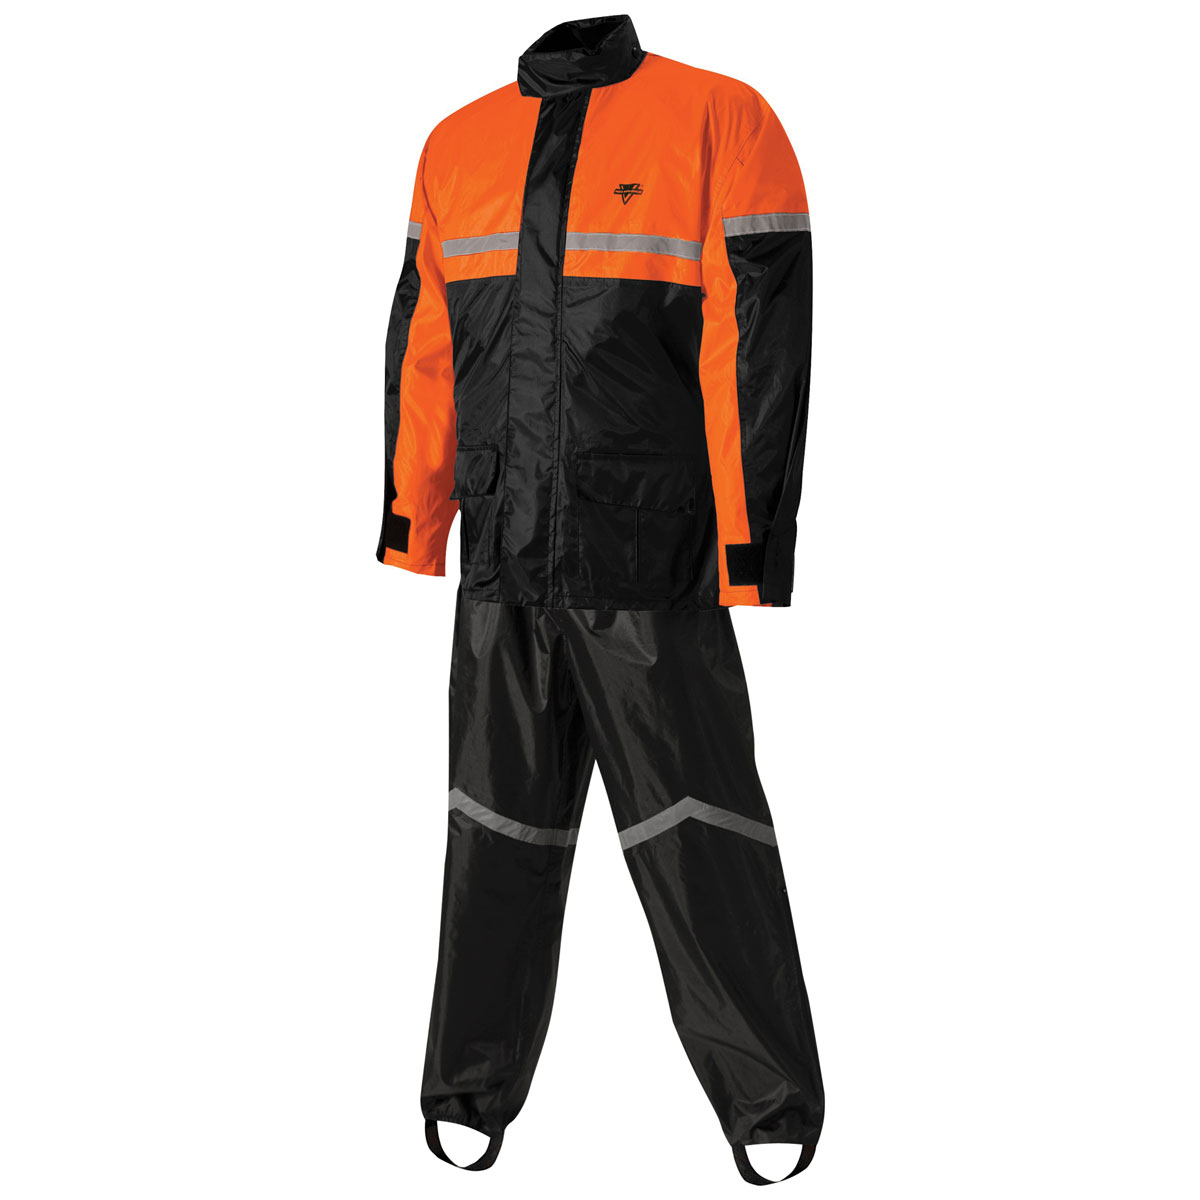 Nelson-Rigg SR-6000 Stormrider Black/Orange Rain Suit